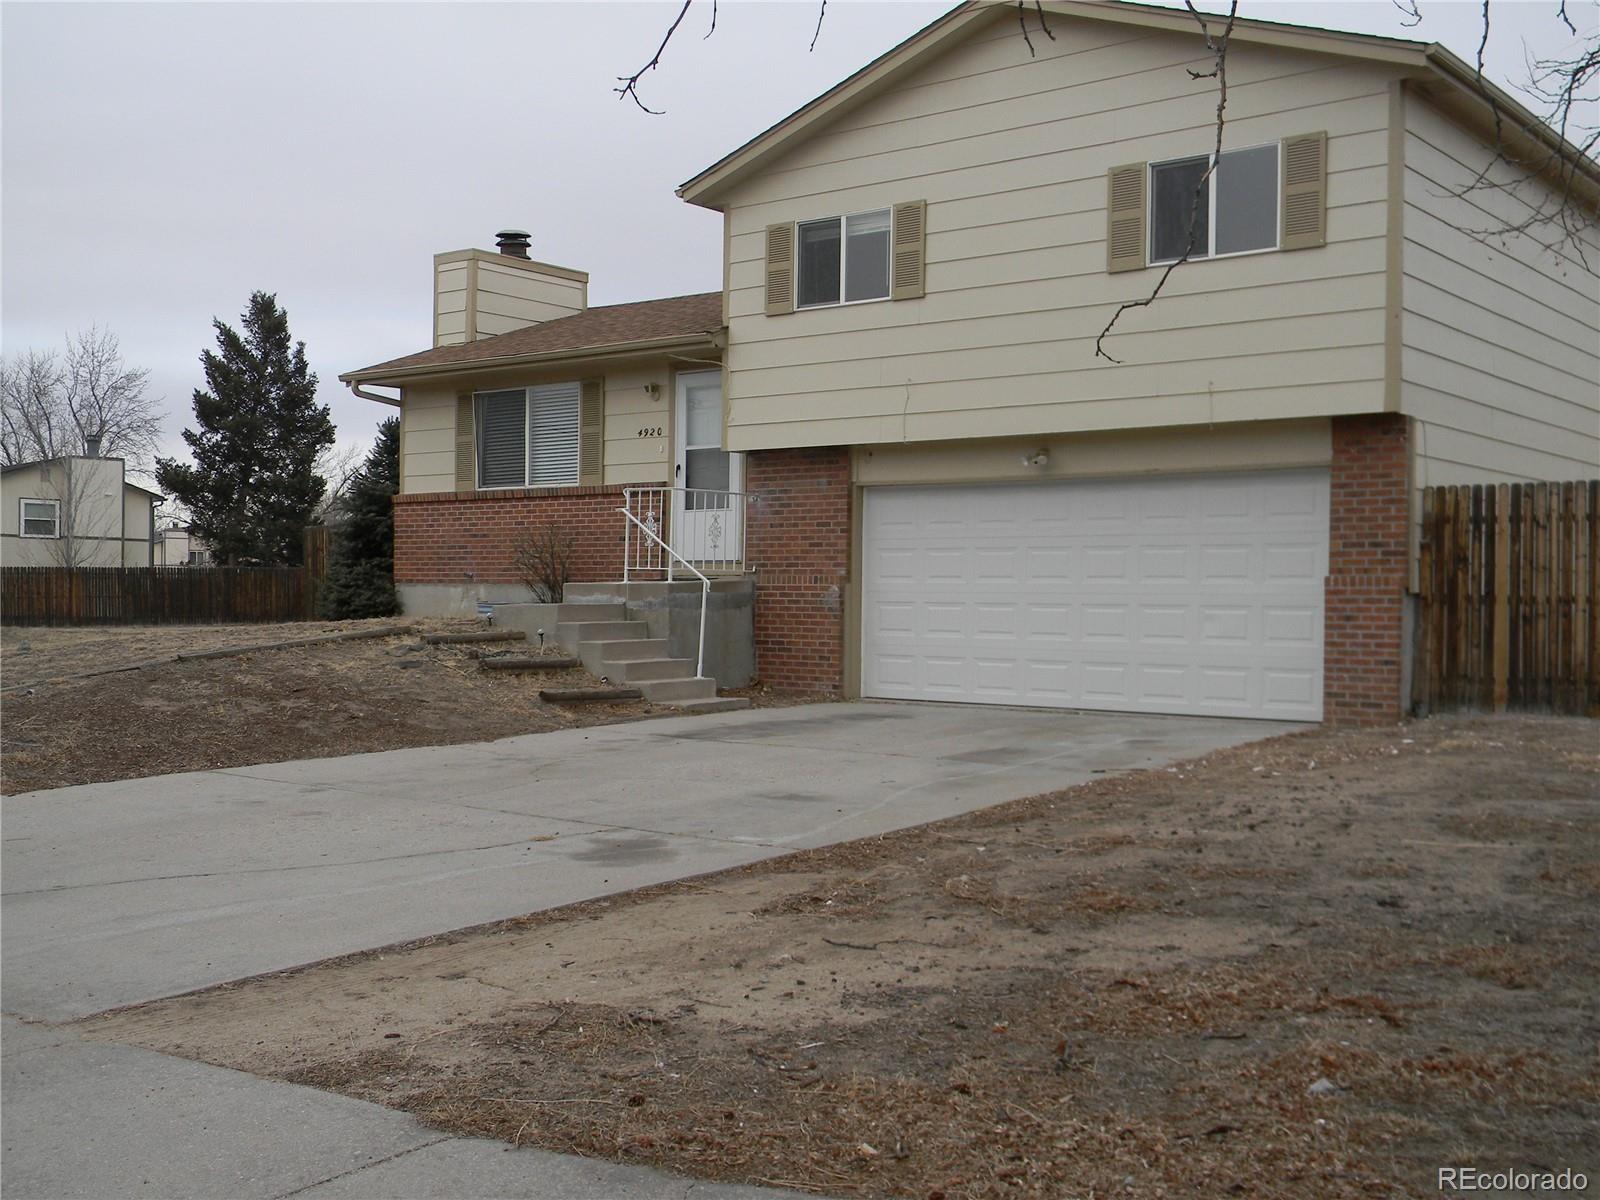 MLS# 5946356 - 2 - 4920 Ridenour Drive, Colorado Springs, CO 80916